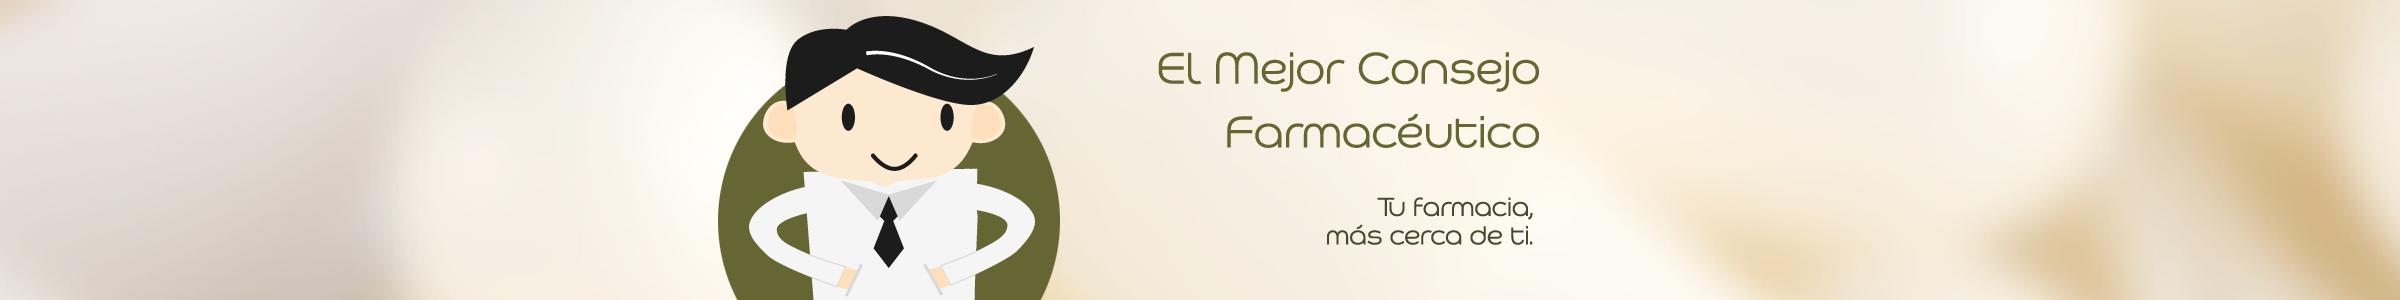 Farmacia El Romeral Vélez Málaga. Parafarmacia. Consejo farmaceutico